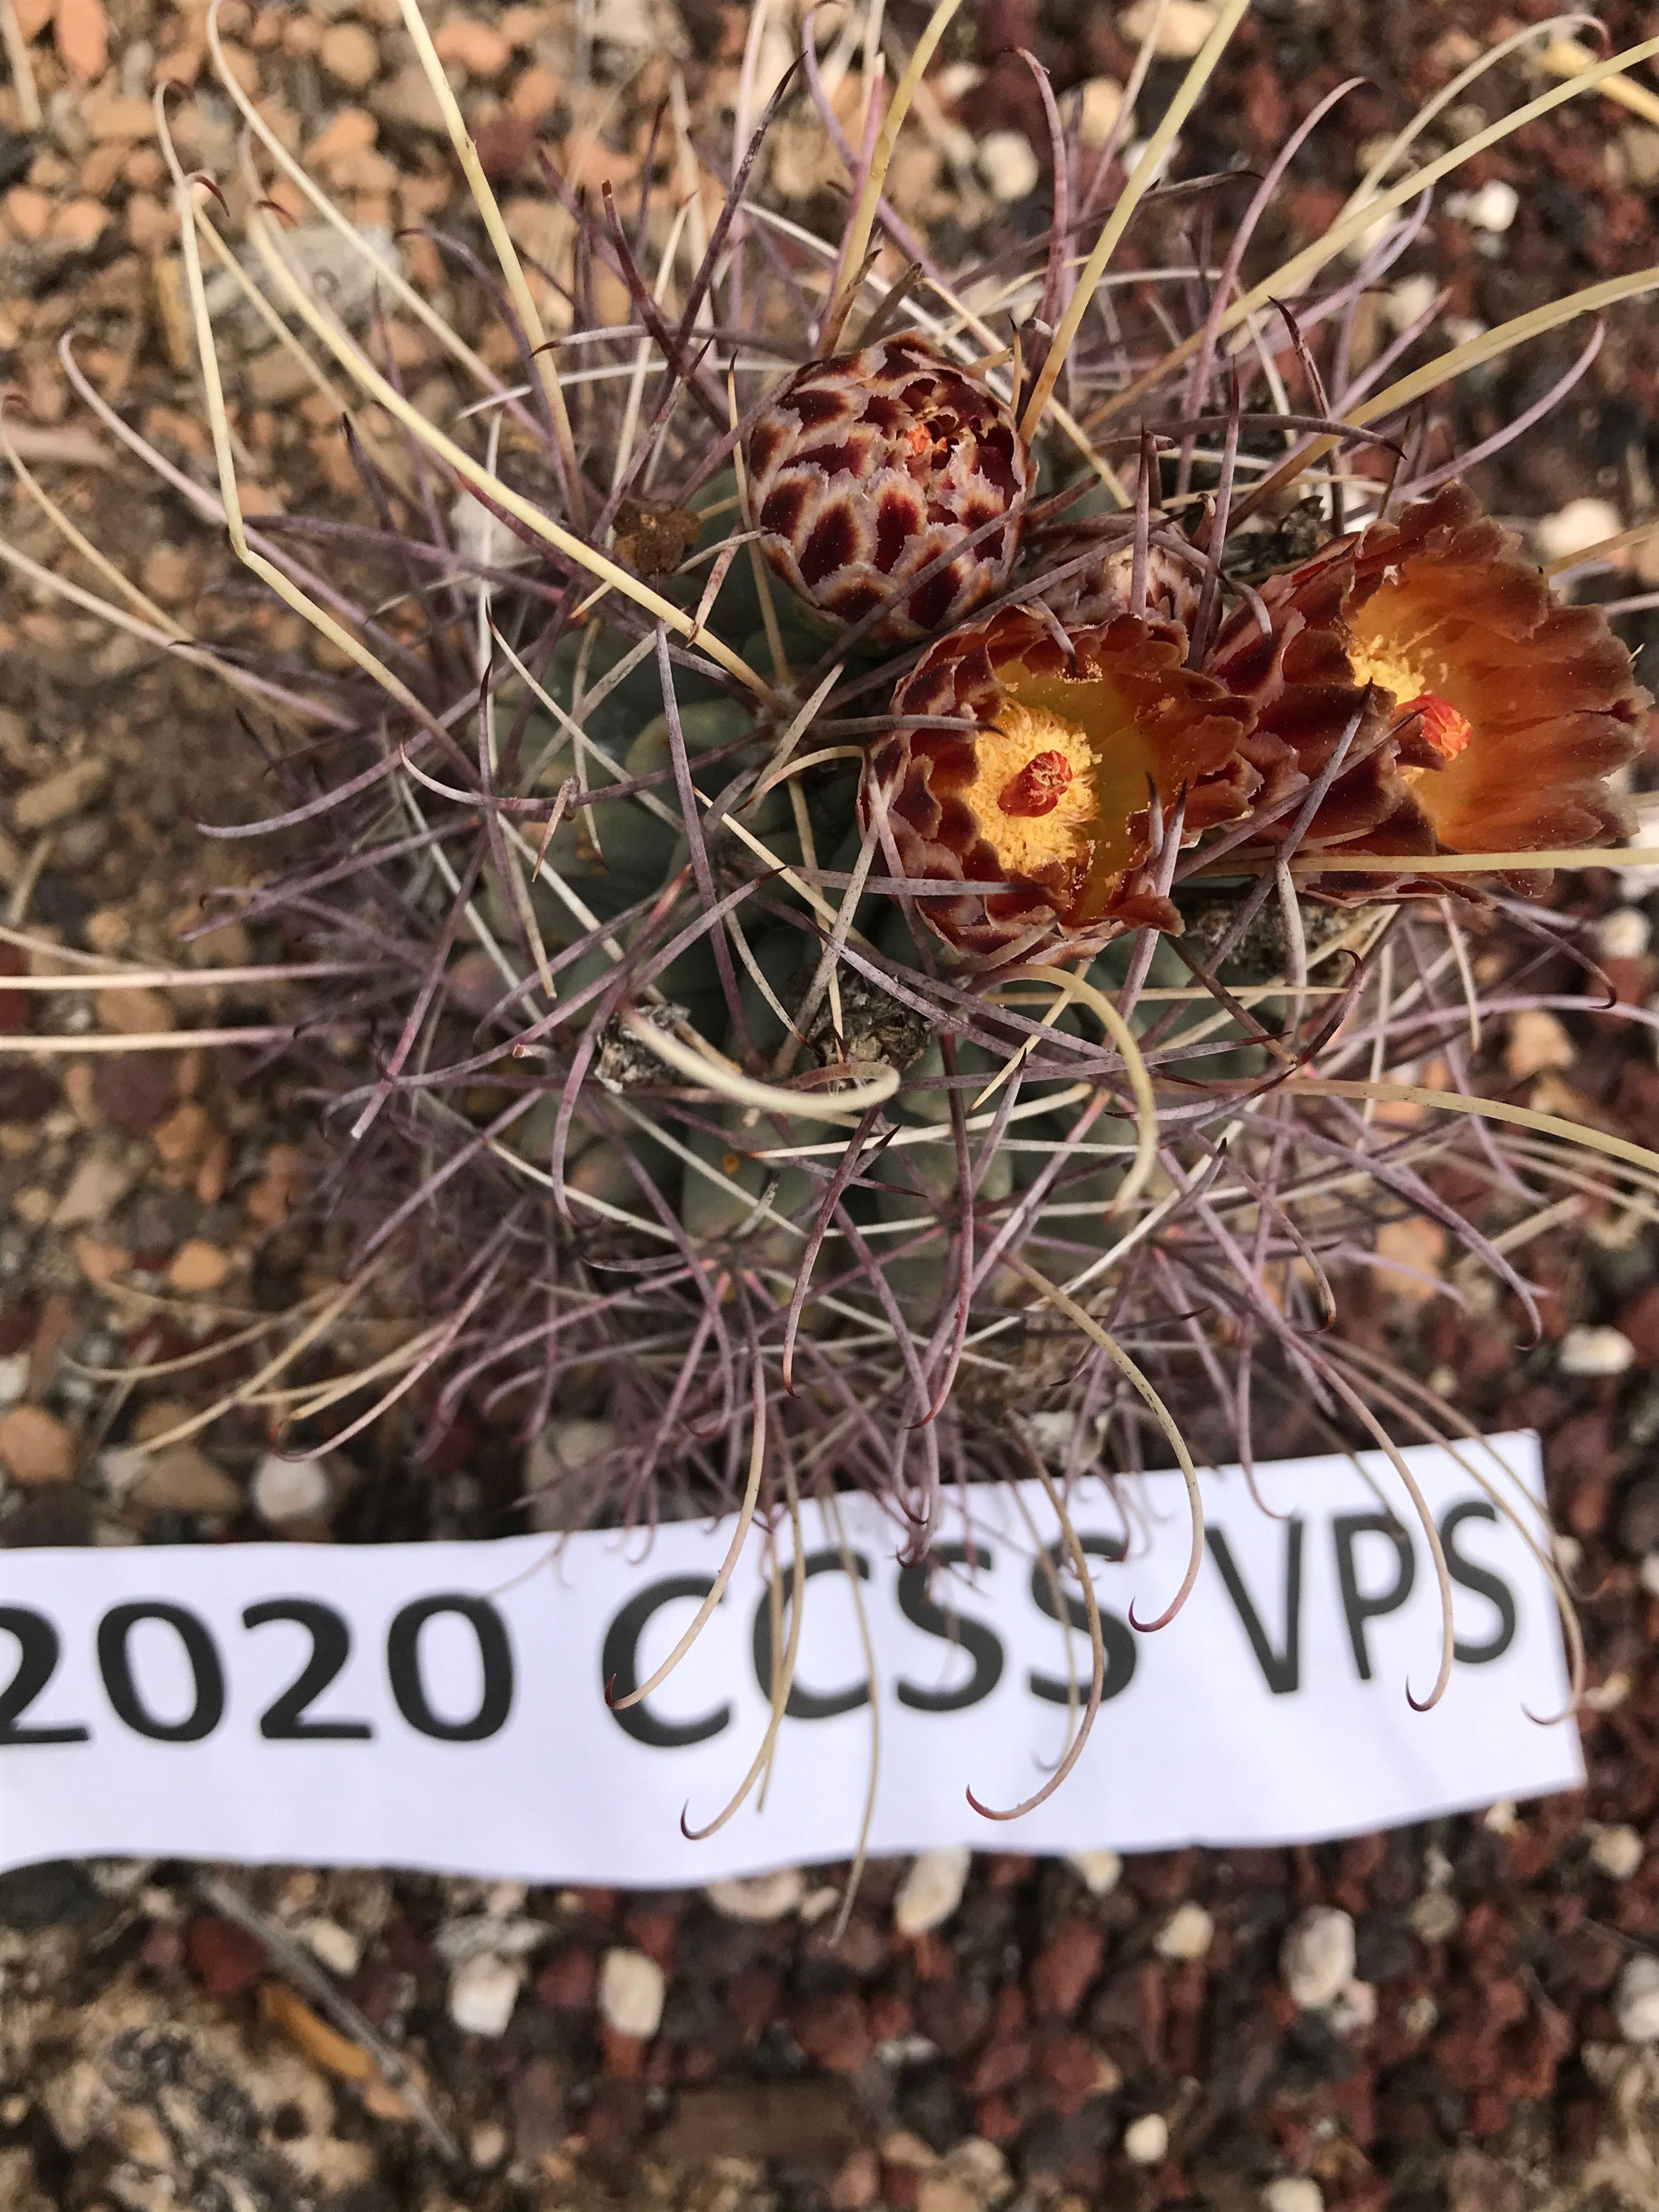 Glandulacactus uncinatus